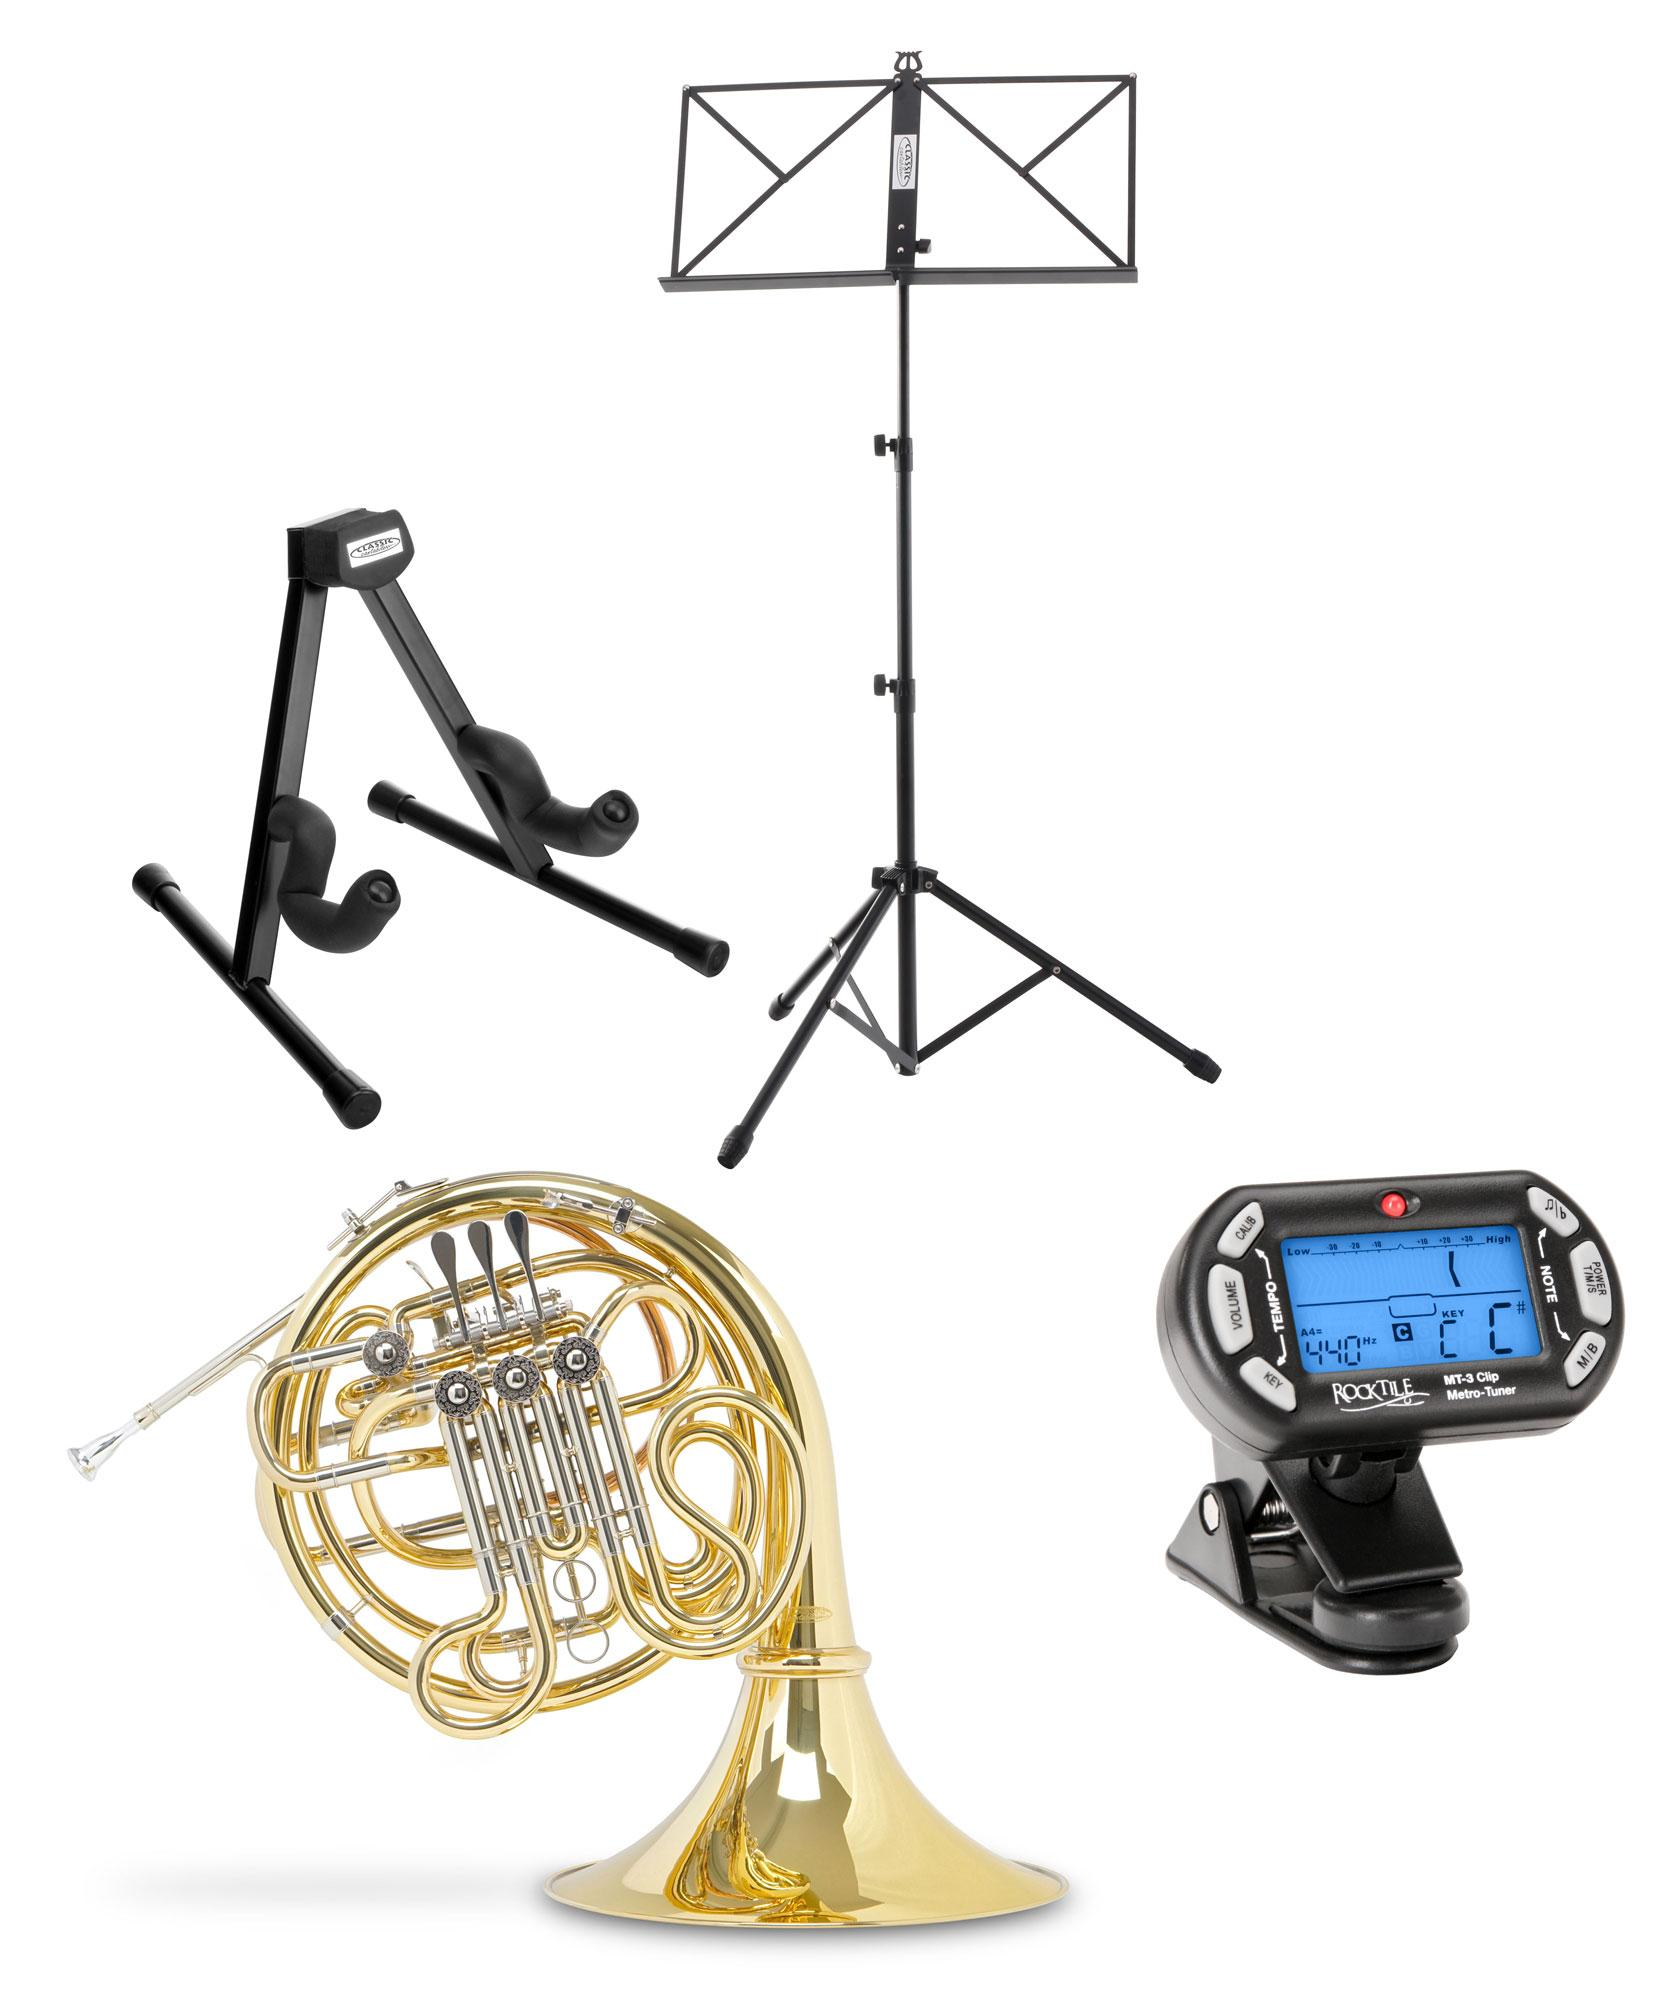 Hoerner - Classic Cantabile Brass WH 801L F Bb Wald  Doppelhorn Set inkl. Koffer, Mundstück, Notenständer, Metronom, Hornständer - Onlineshop Musikhaus Kirstein